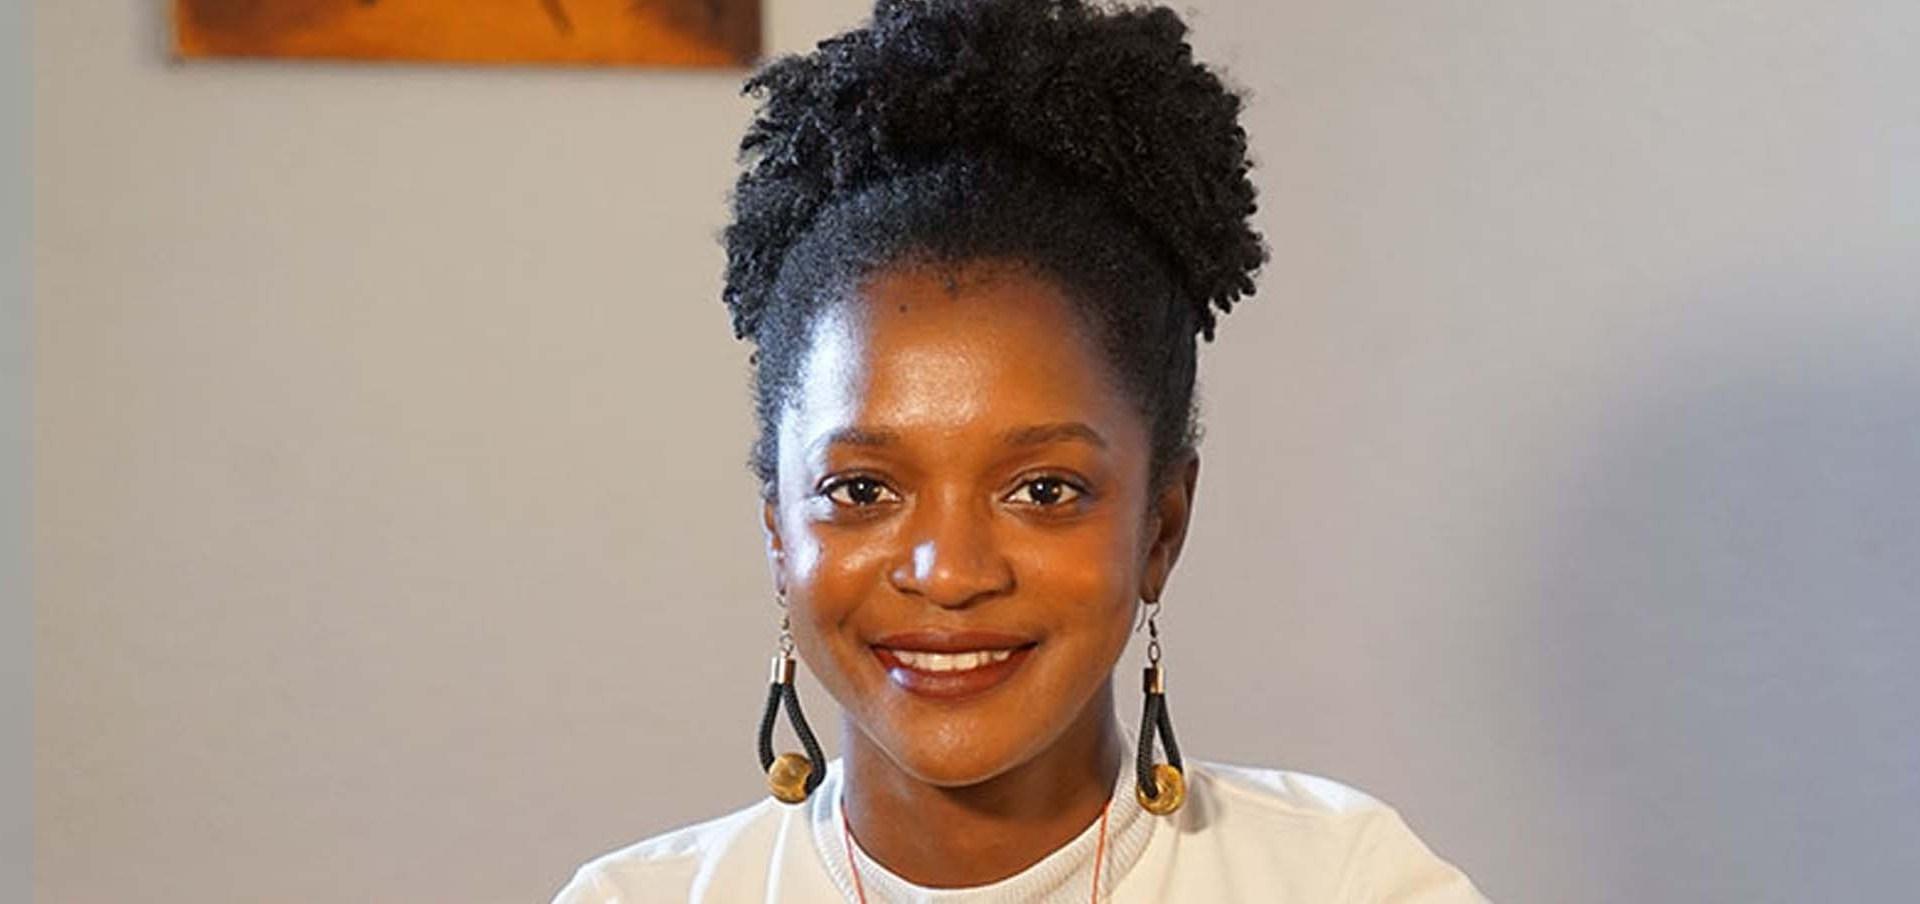 Cameroon's Manka Angwafo Wins the 2019 Cartier Women's Initiative Award for sub-Saharan Africa